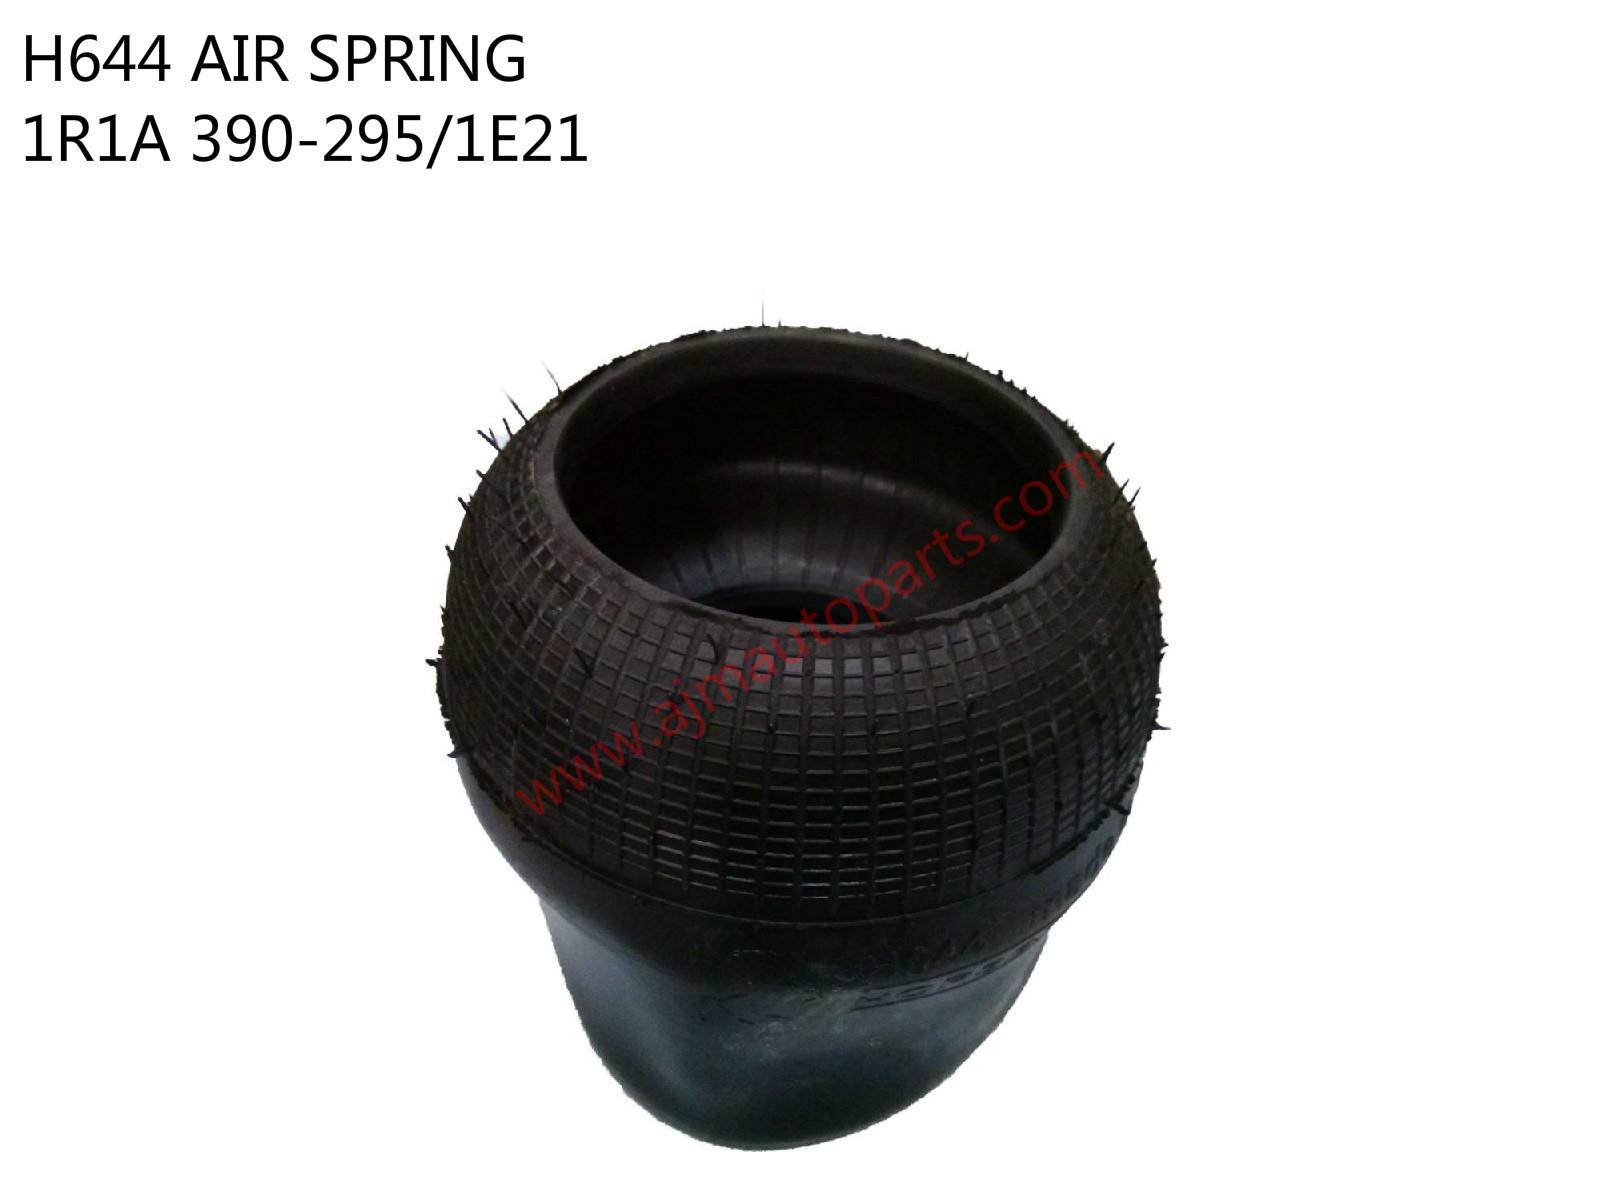 H644 AIR SPRING